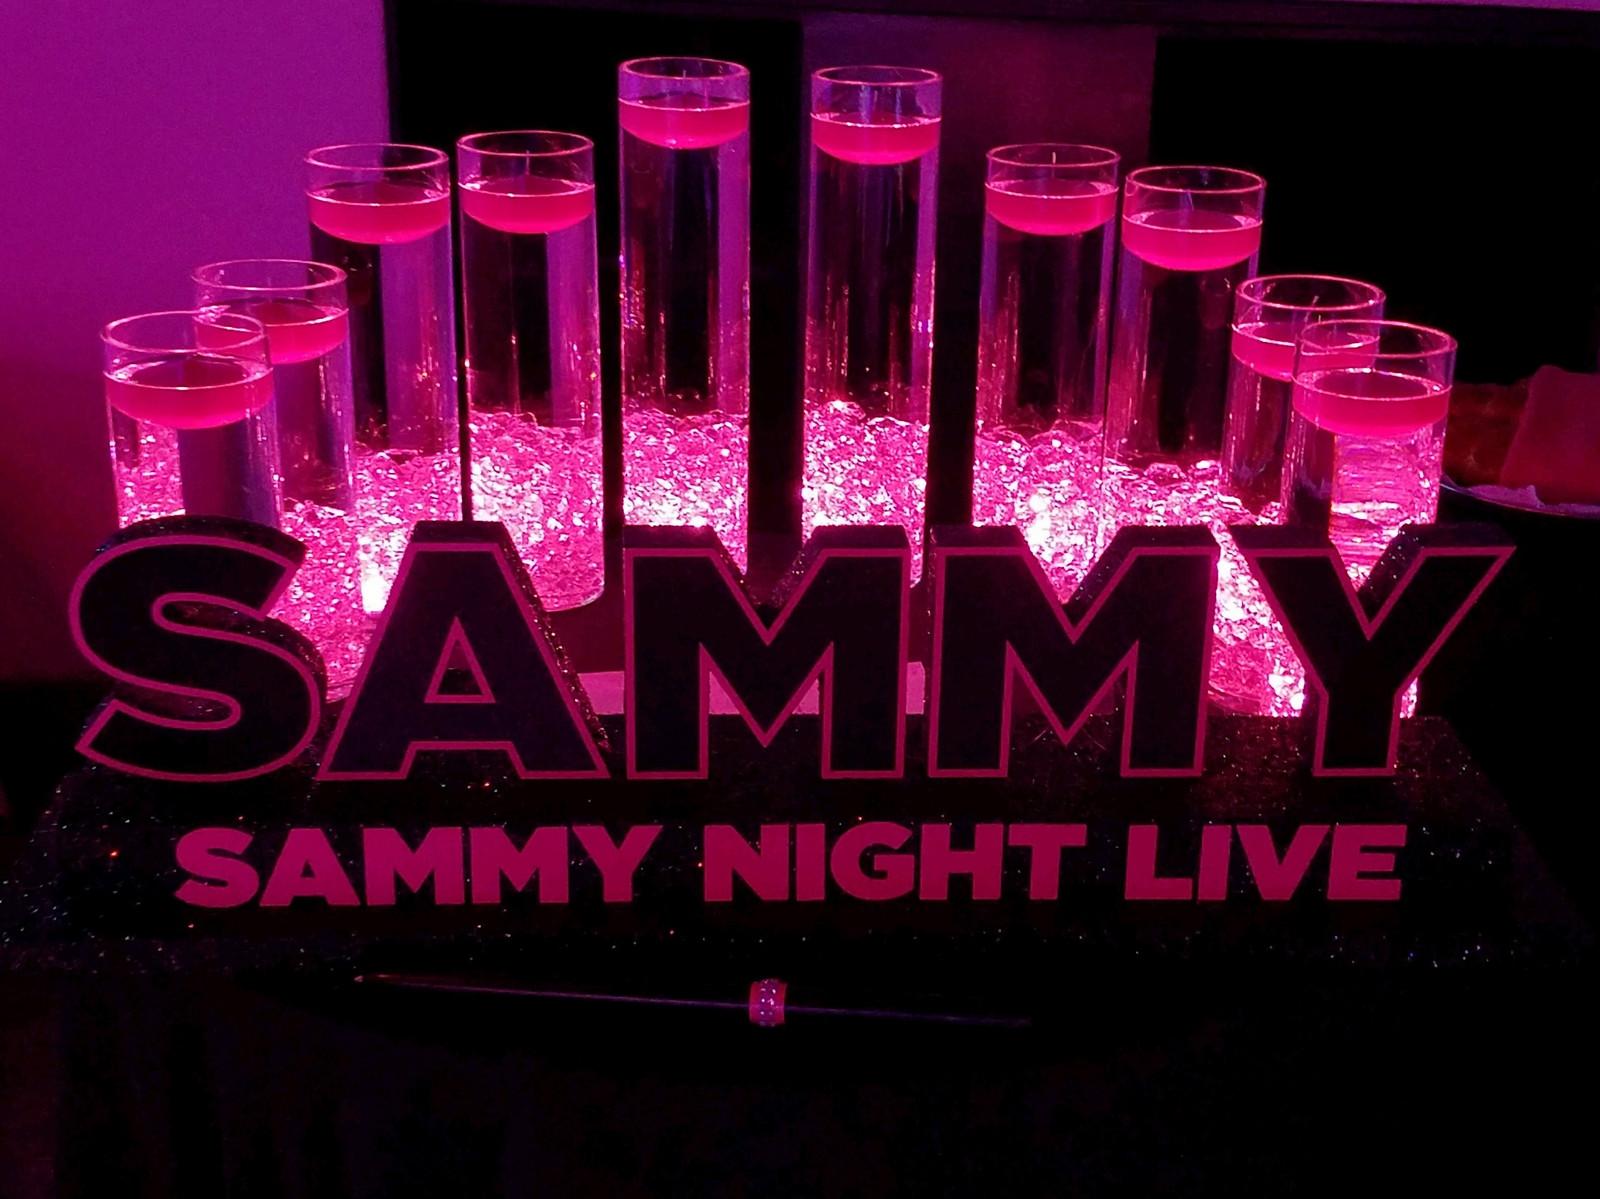 Sammy night live bat mitzvah candle lighting display the decorated sammy night live bat mitzvah candle lighting display aloadofball Image collections